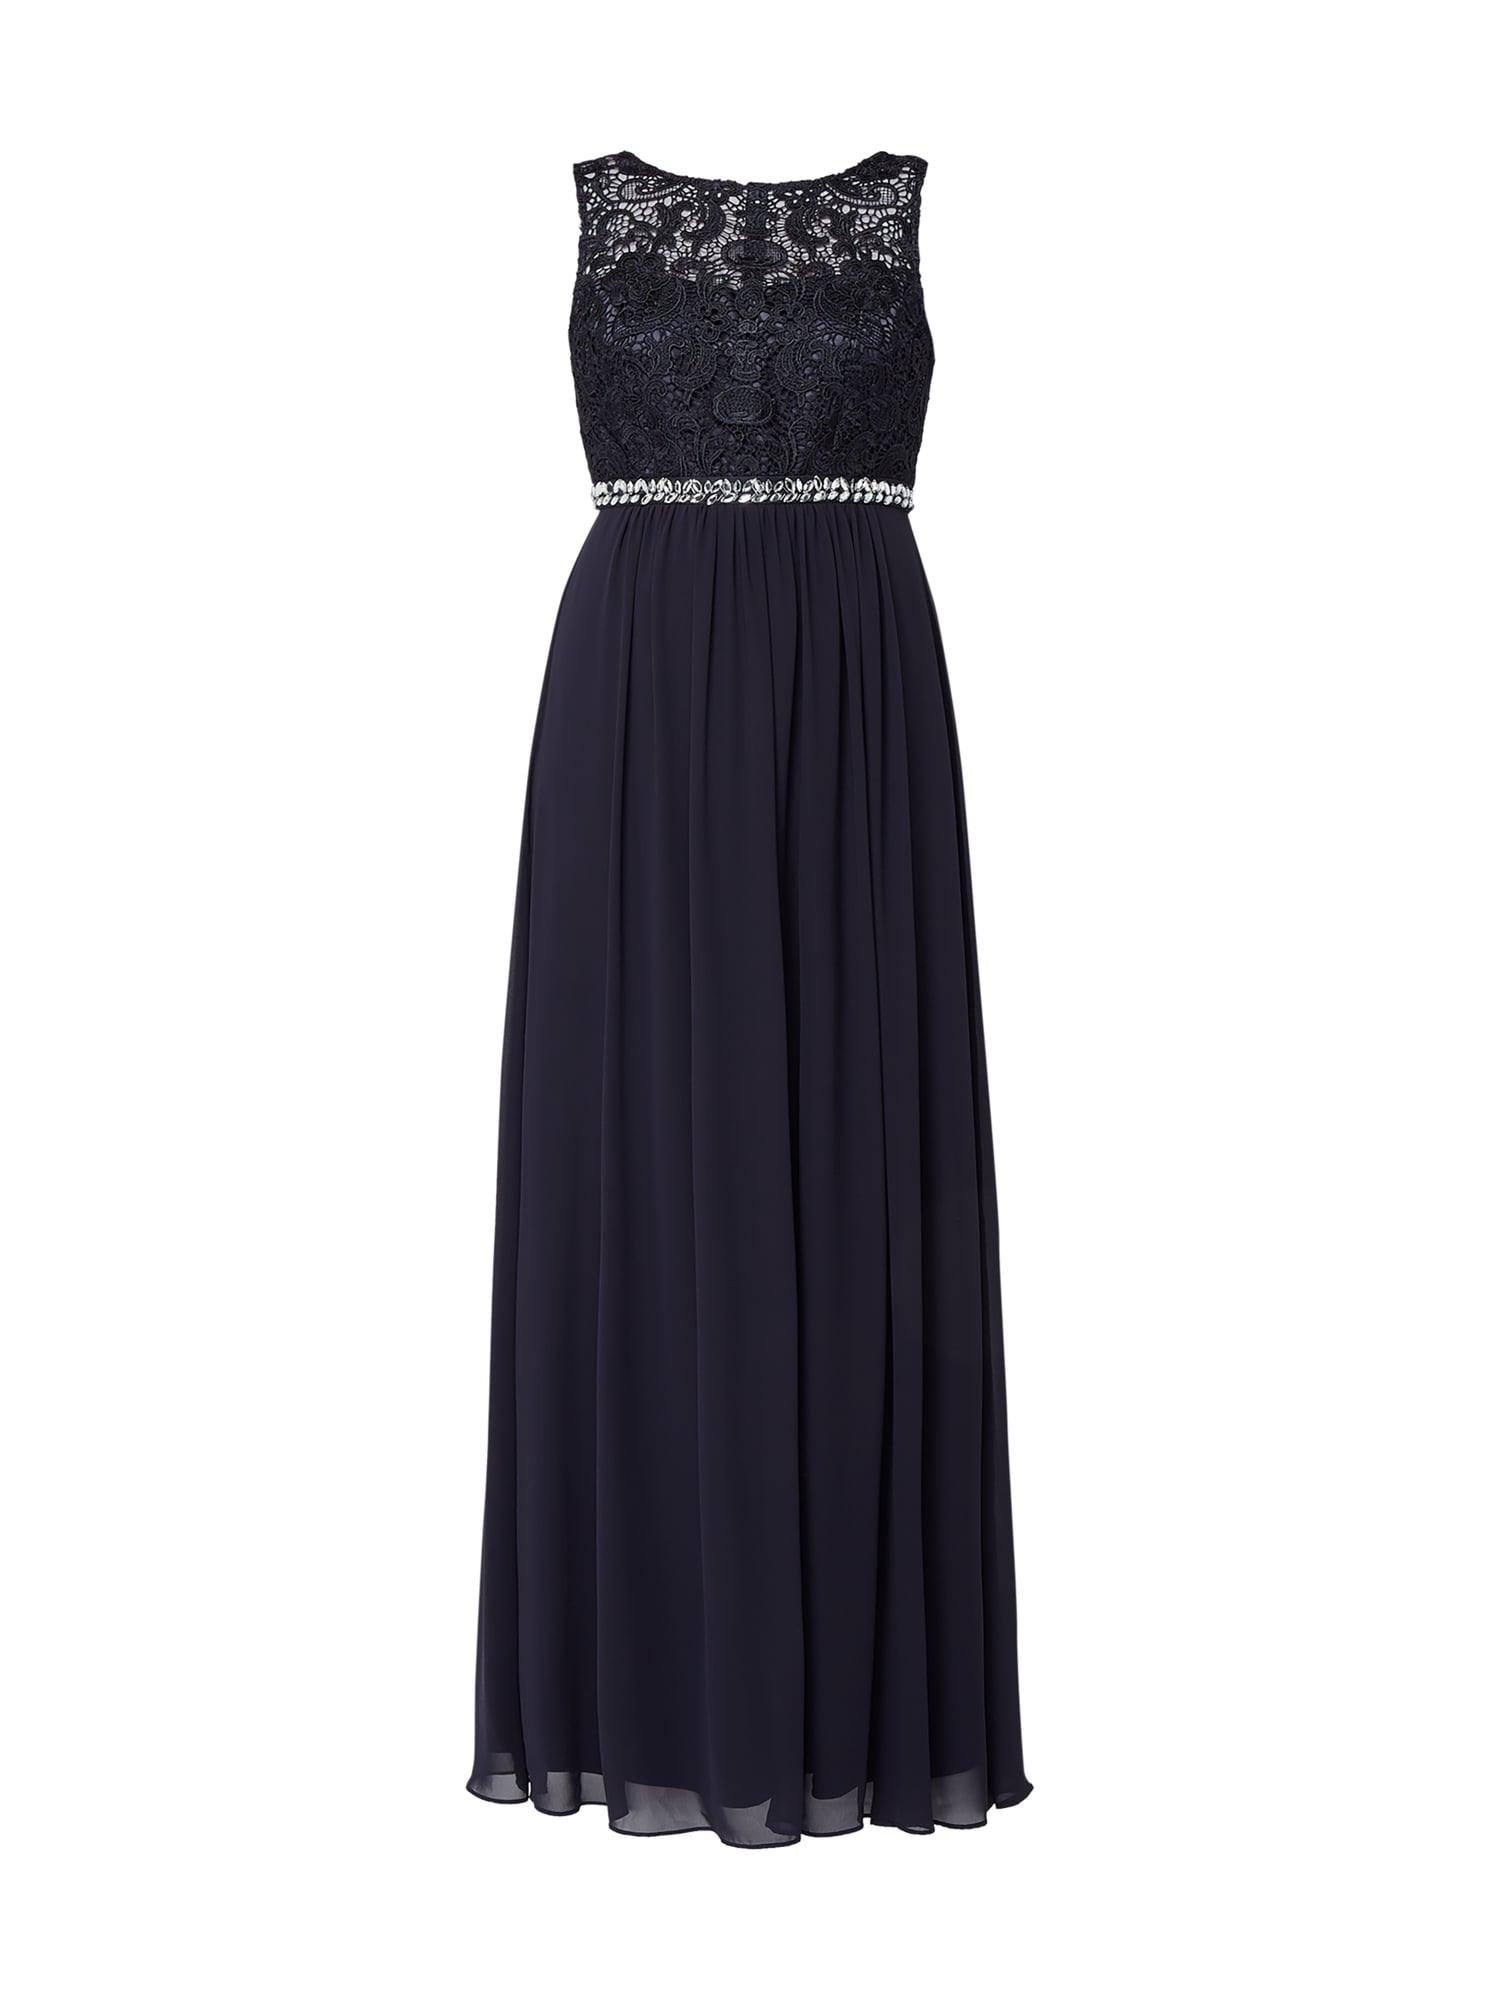 13 Spektakulär Jakes Abendkleid Blau Boutique10 Großartig Jakes Abendkleid Blau Galerie